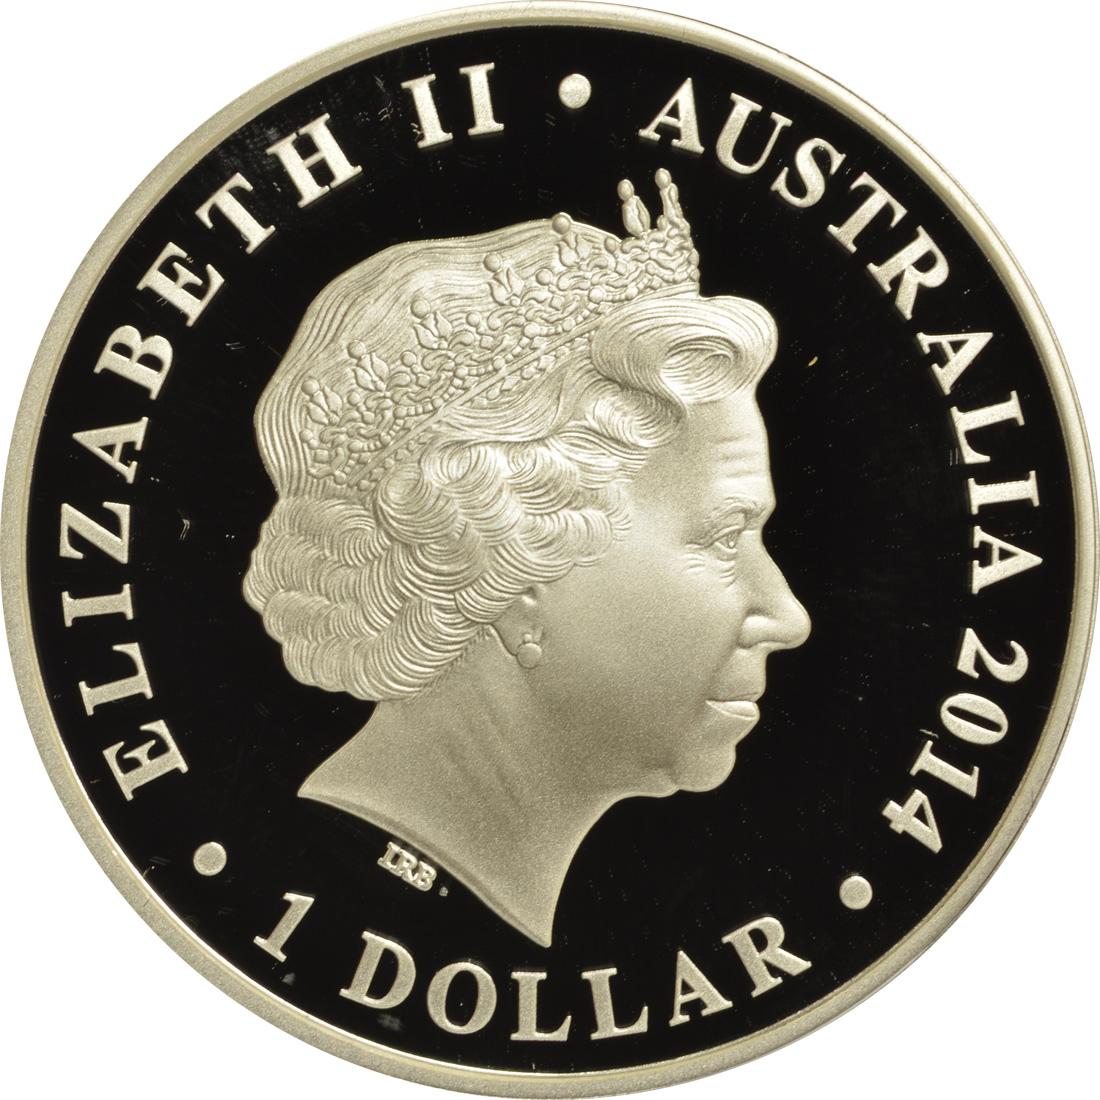 australien 1 dollar australische megafauna thylacoleo farbig 2014 silber pp euro. Black Bedroom Furniture Sets. Home Design Ideas